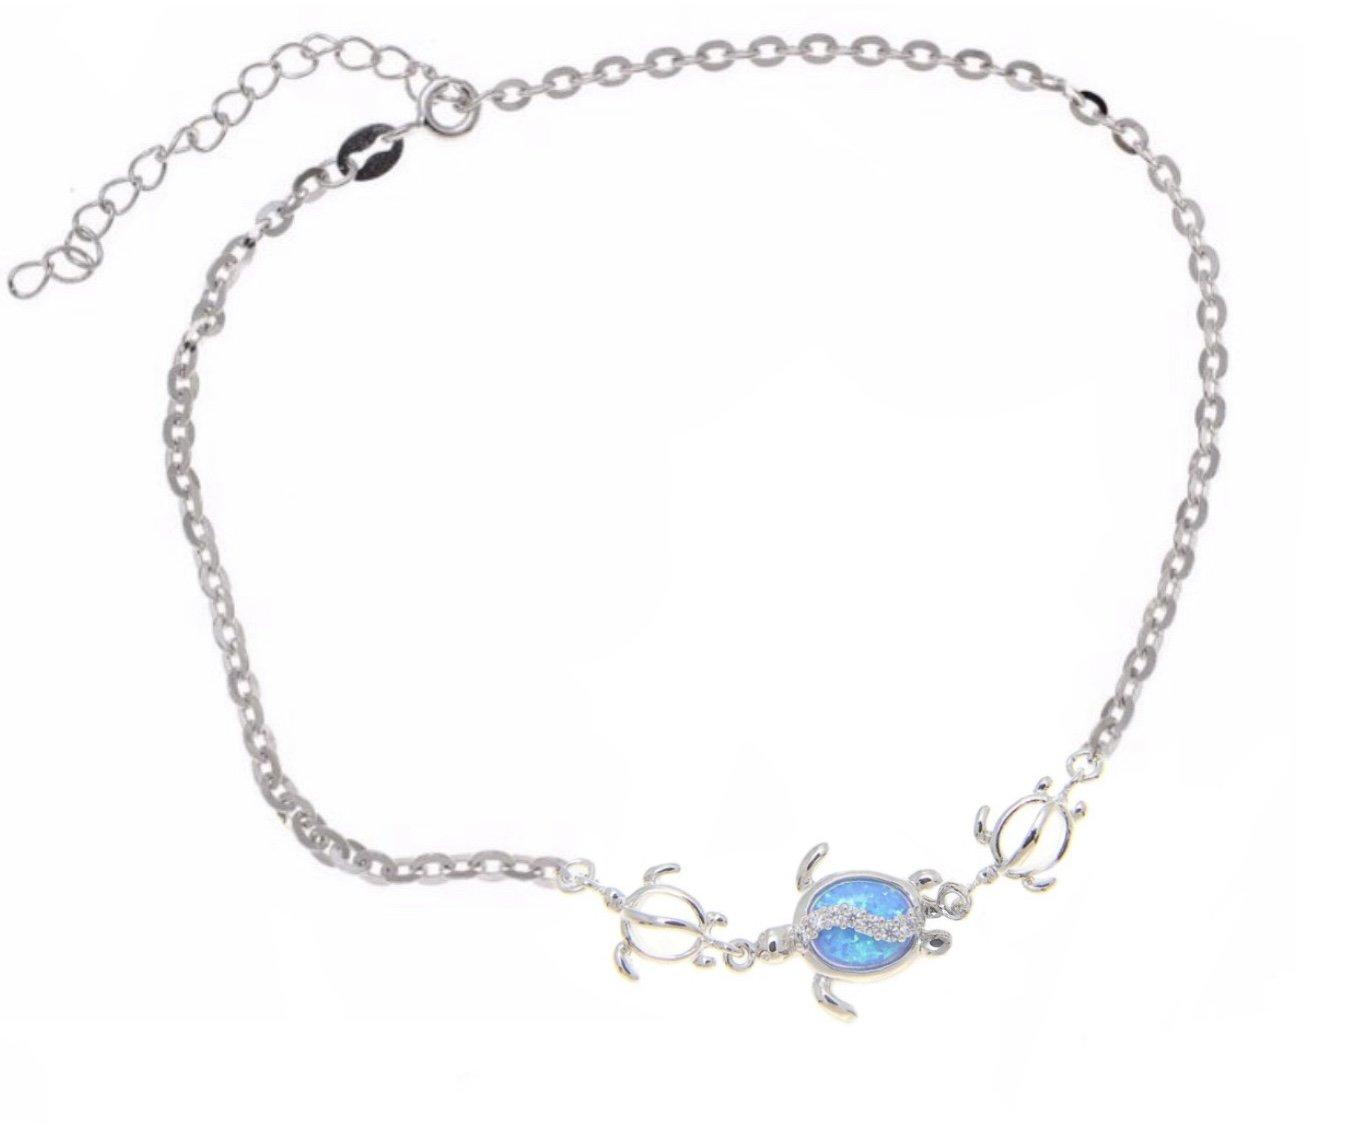 Opal Turtle Family Anklet / Bracelet